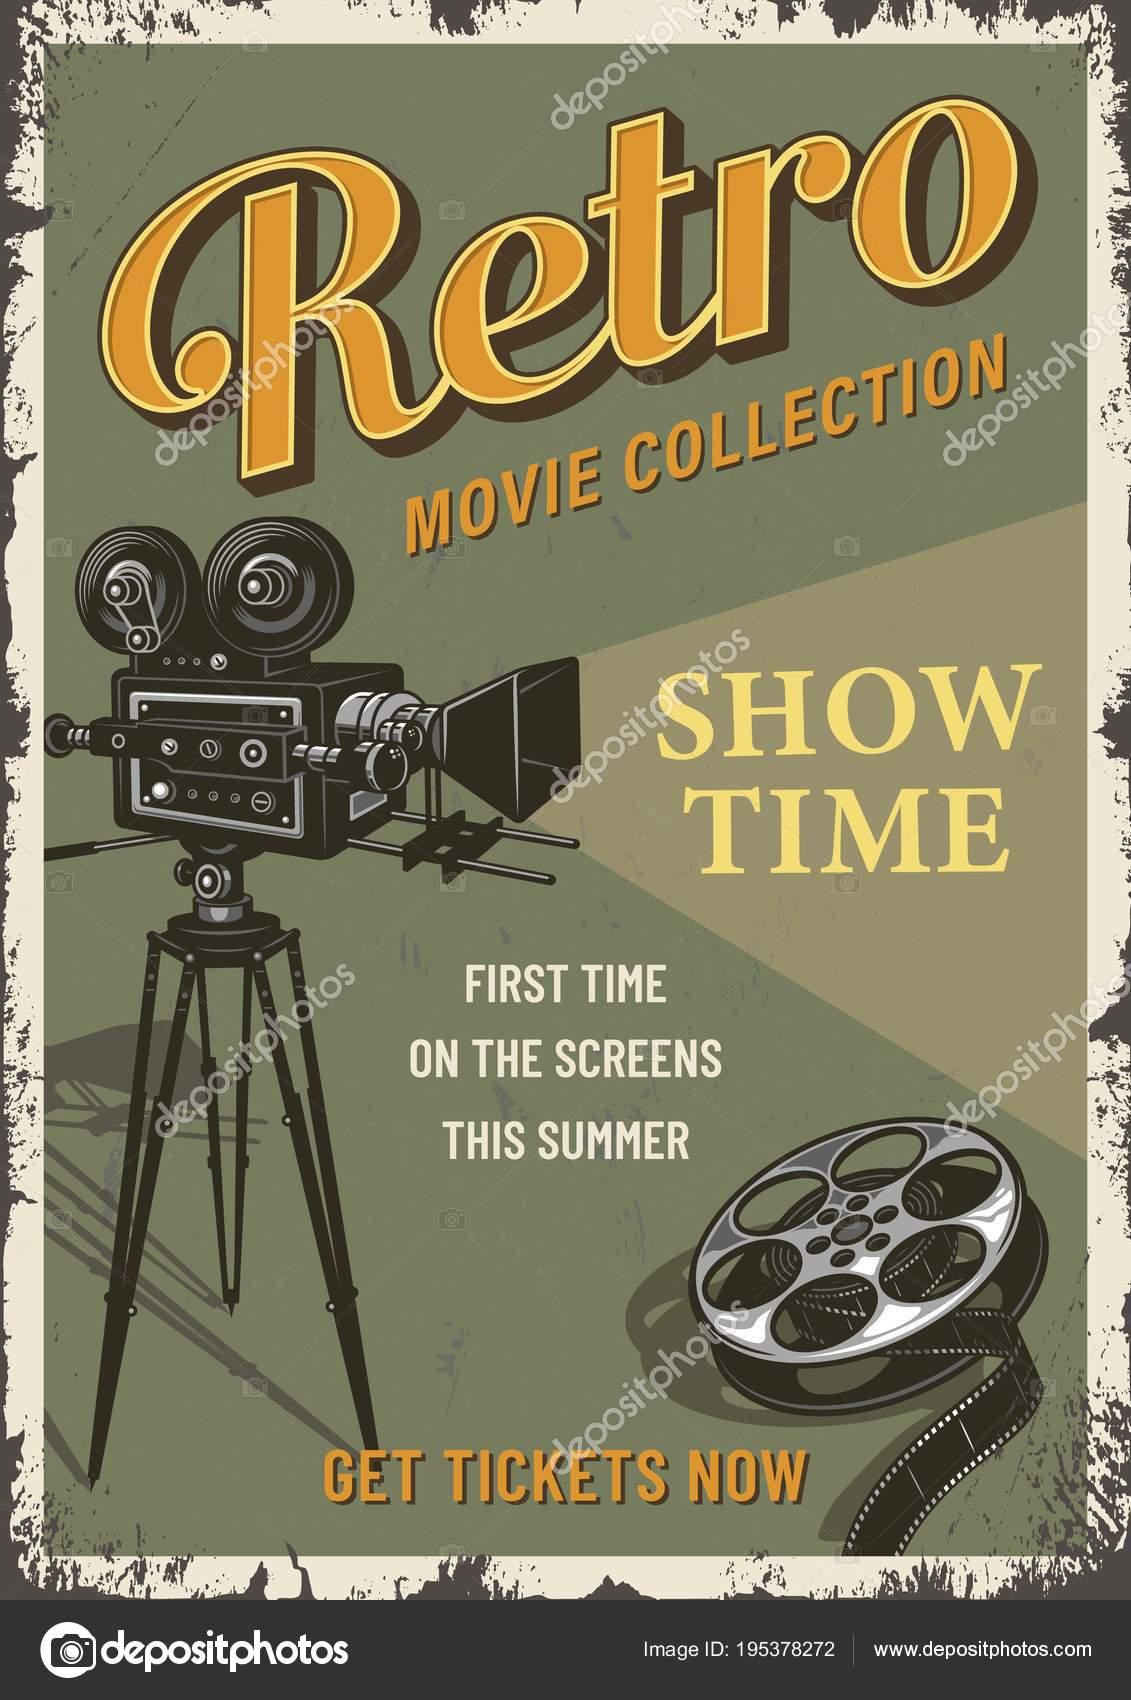 Kino Film Festival Plakat Vorlage — Stockvektor © IMOGI #195378272